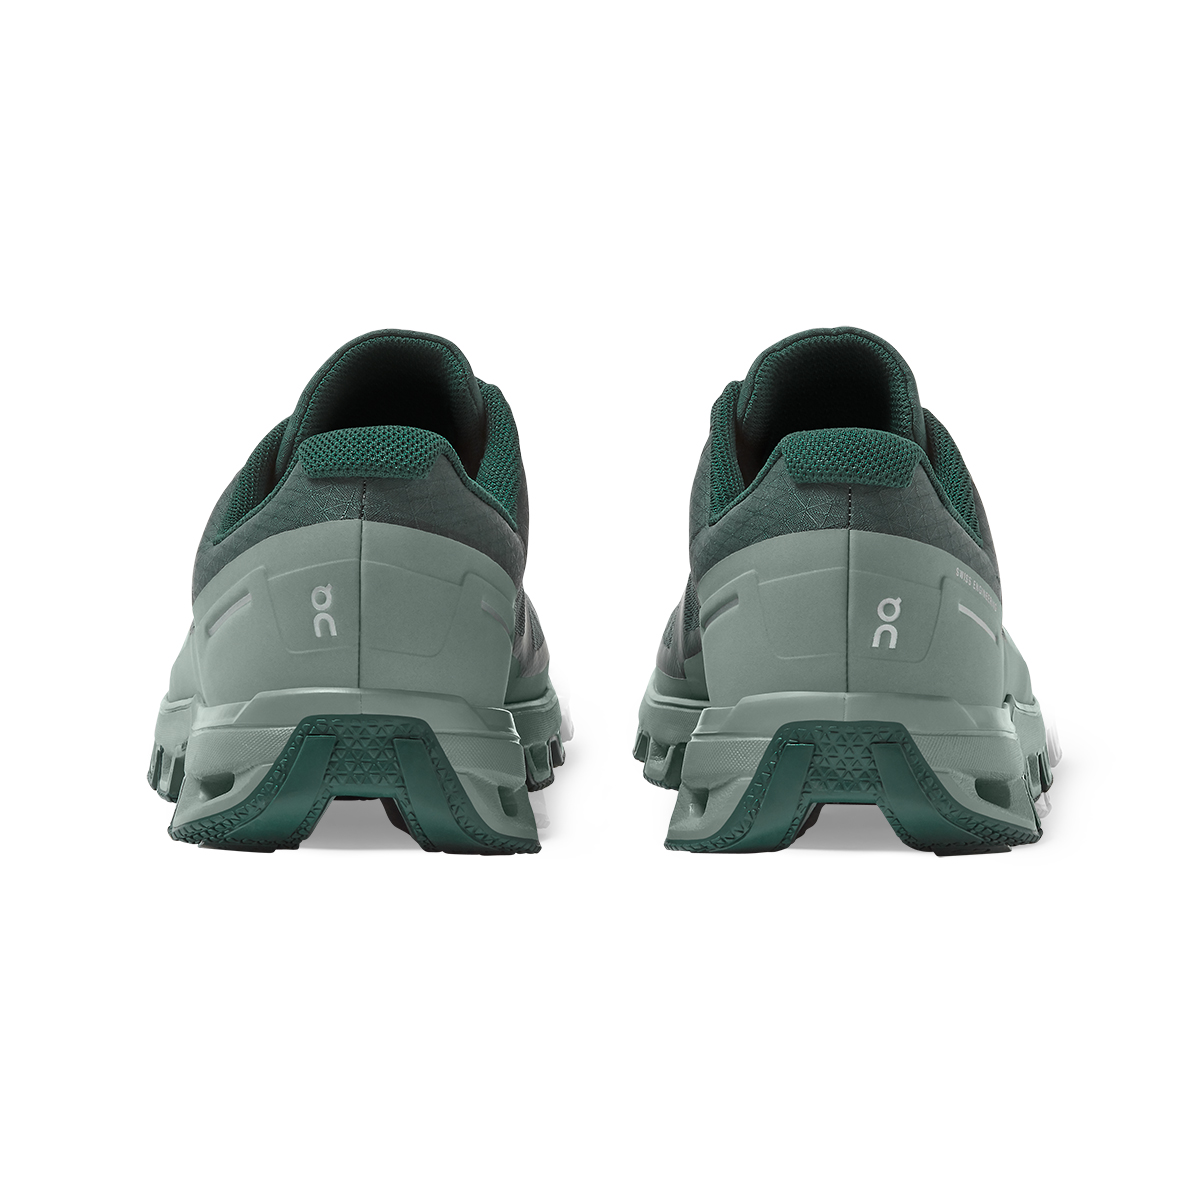 Women's On Cloudventure Waterproof Trail Running Shoe - Color: Juniper/Sea - Size: 5 - Width: Regular, Juniper/Sea, large, image 3